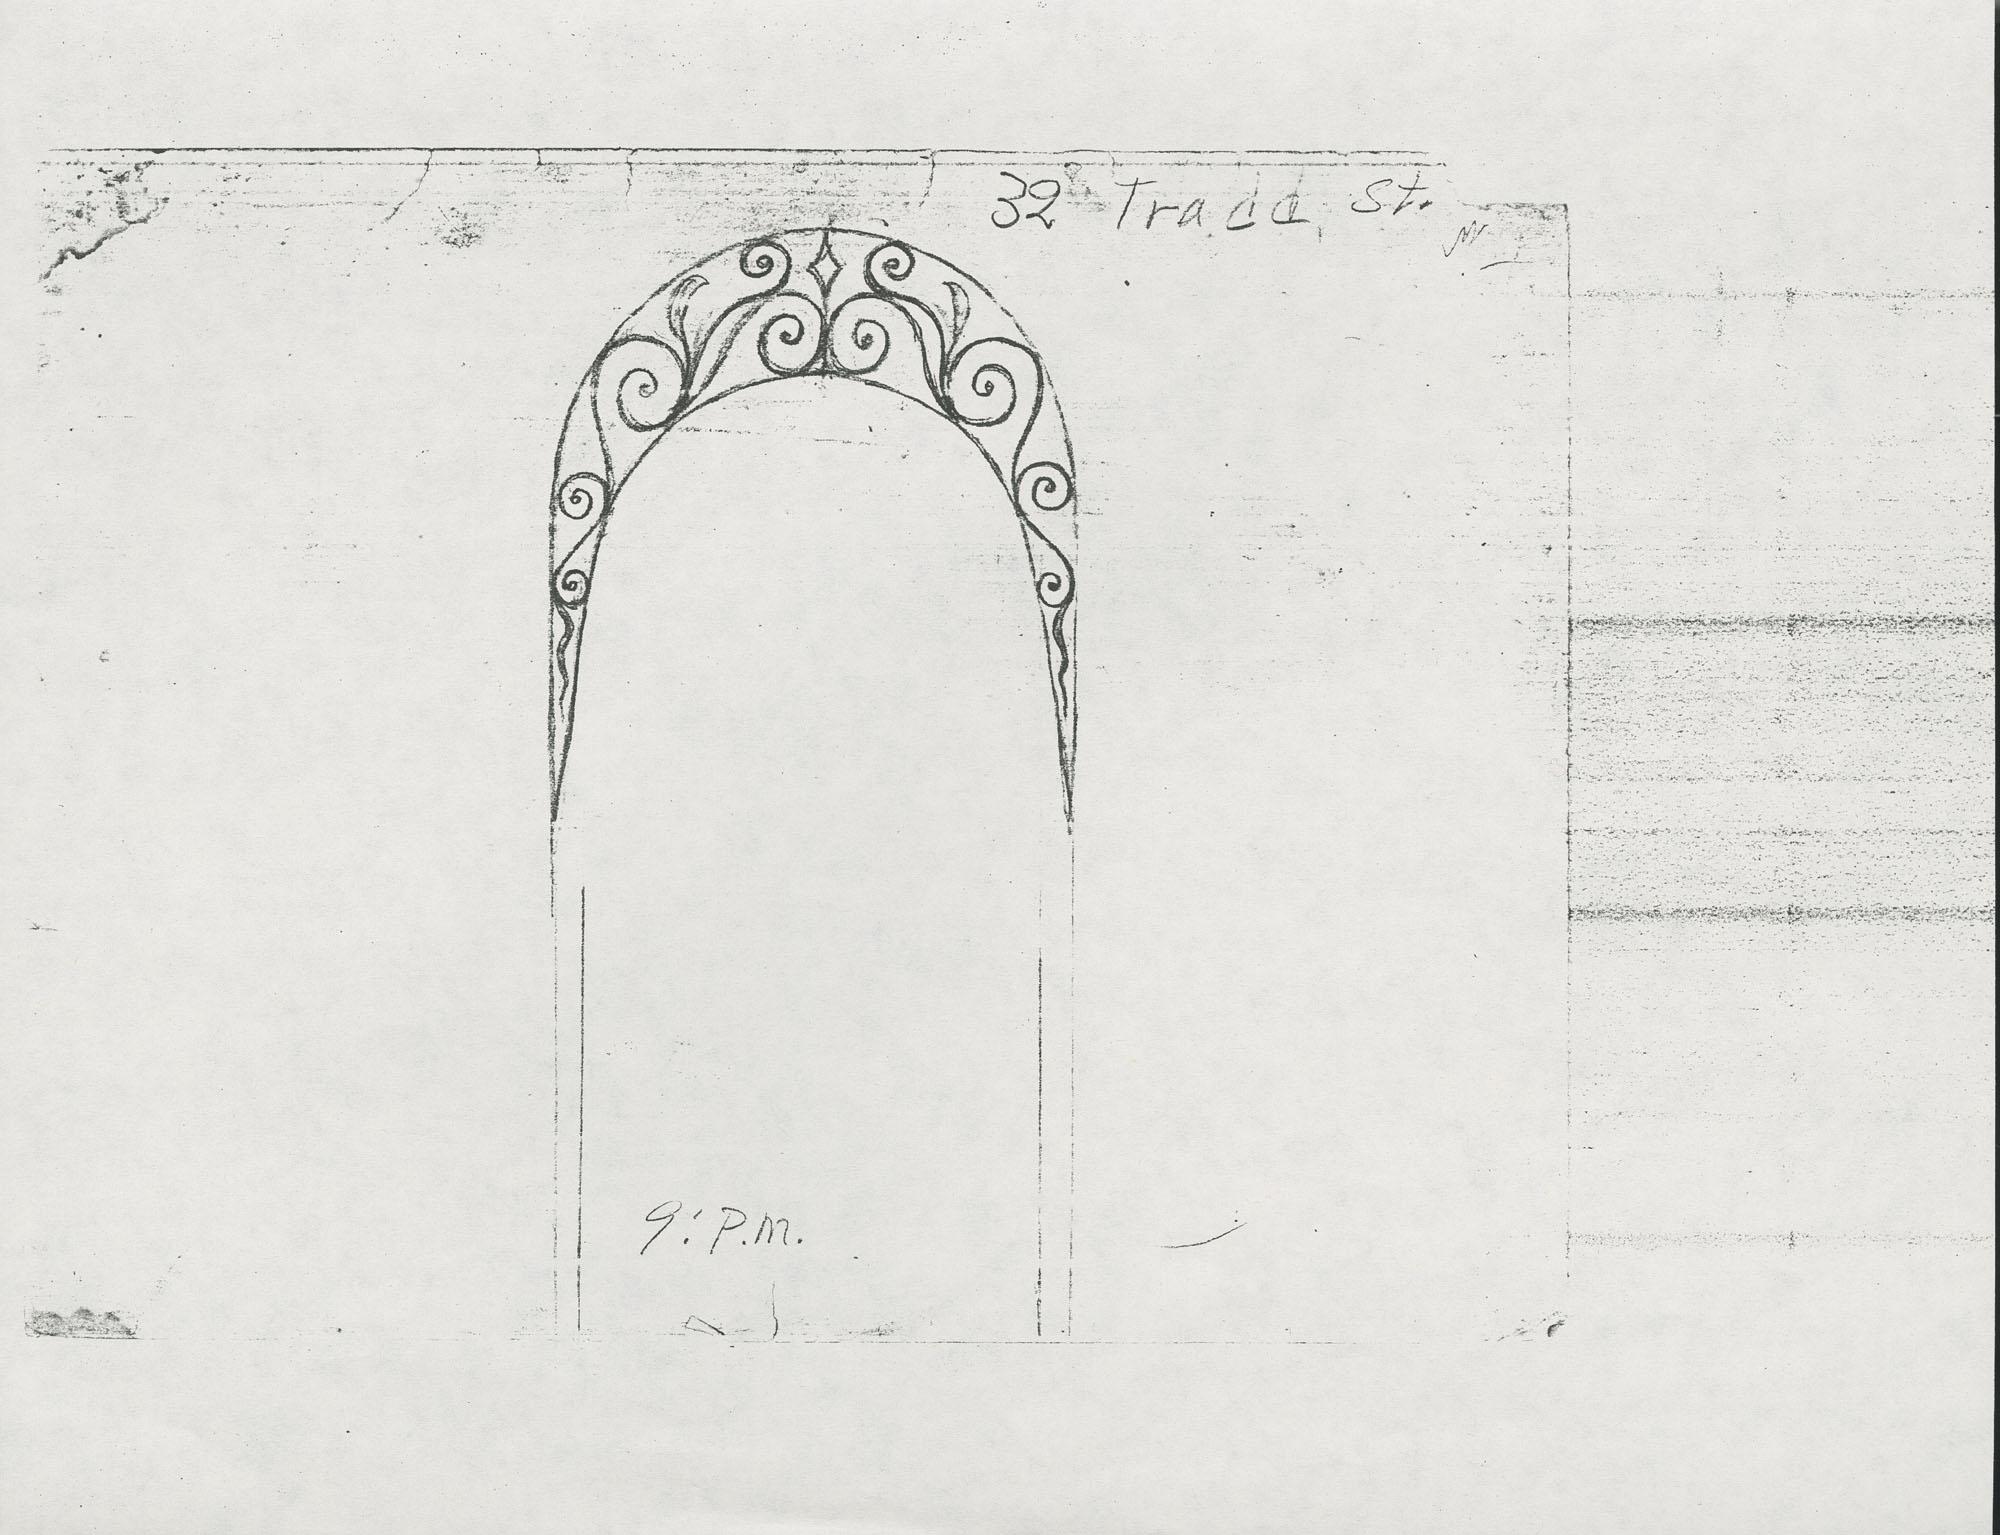 32 Tradd Street archway